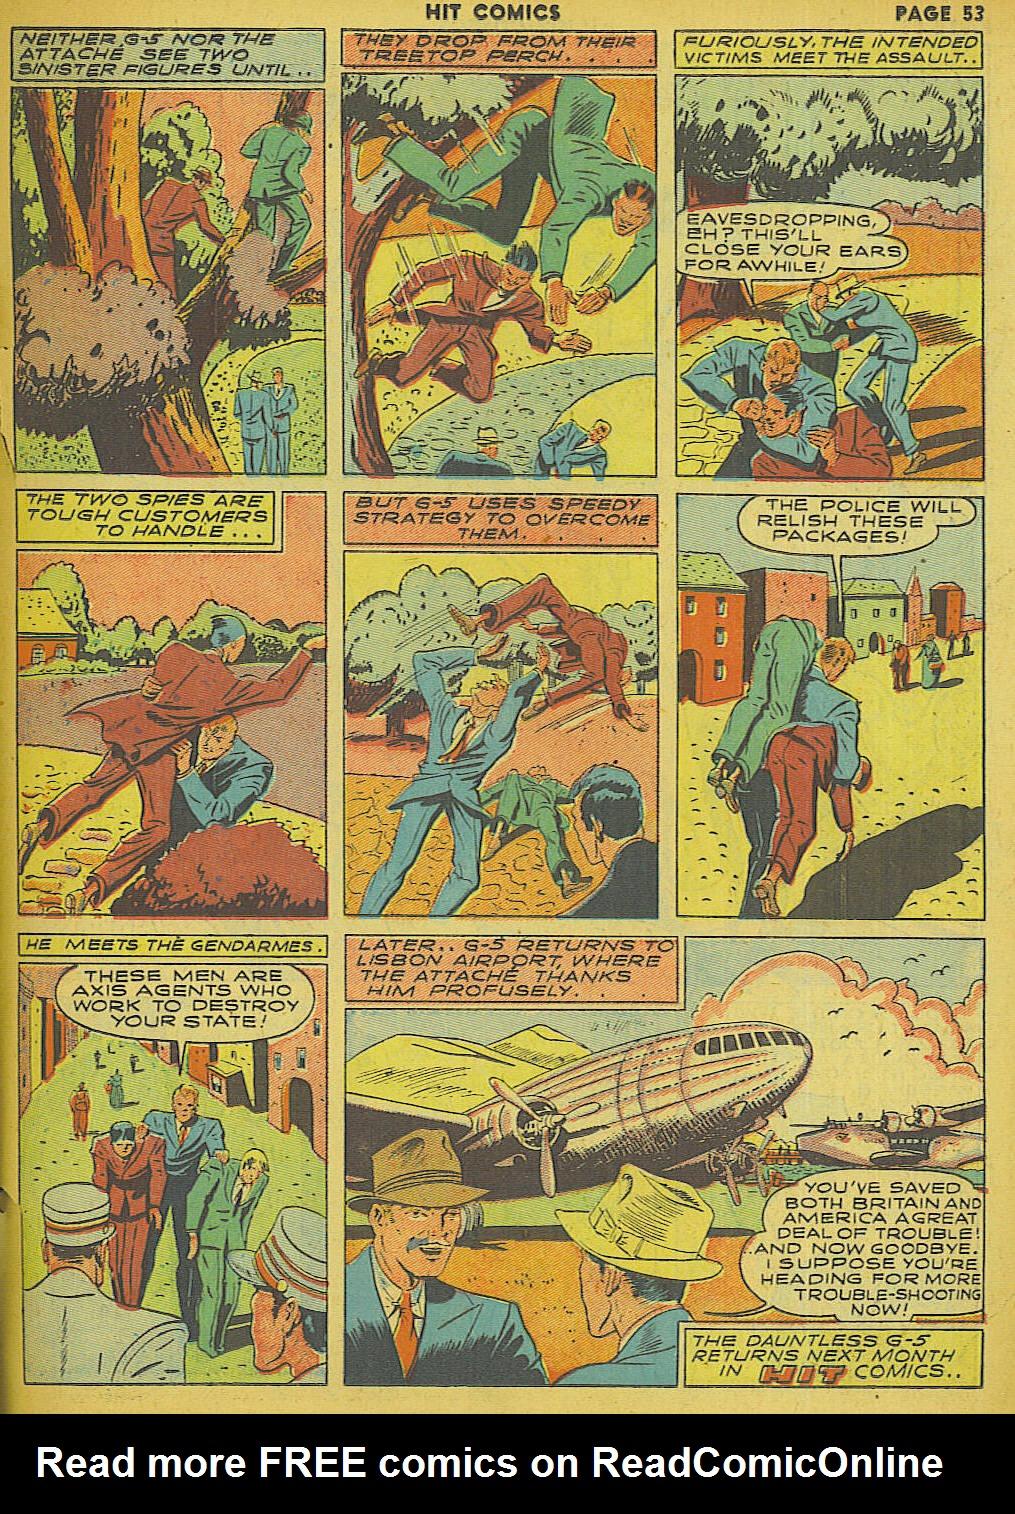 Read online Hit Comics comic -  Issue #13 - 55